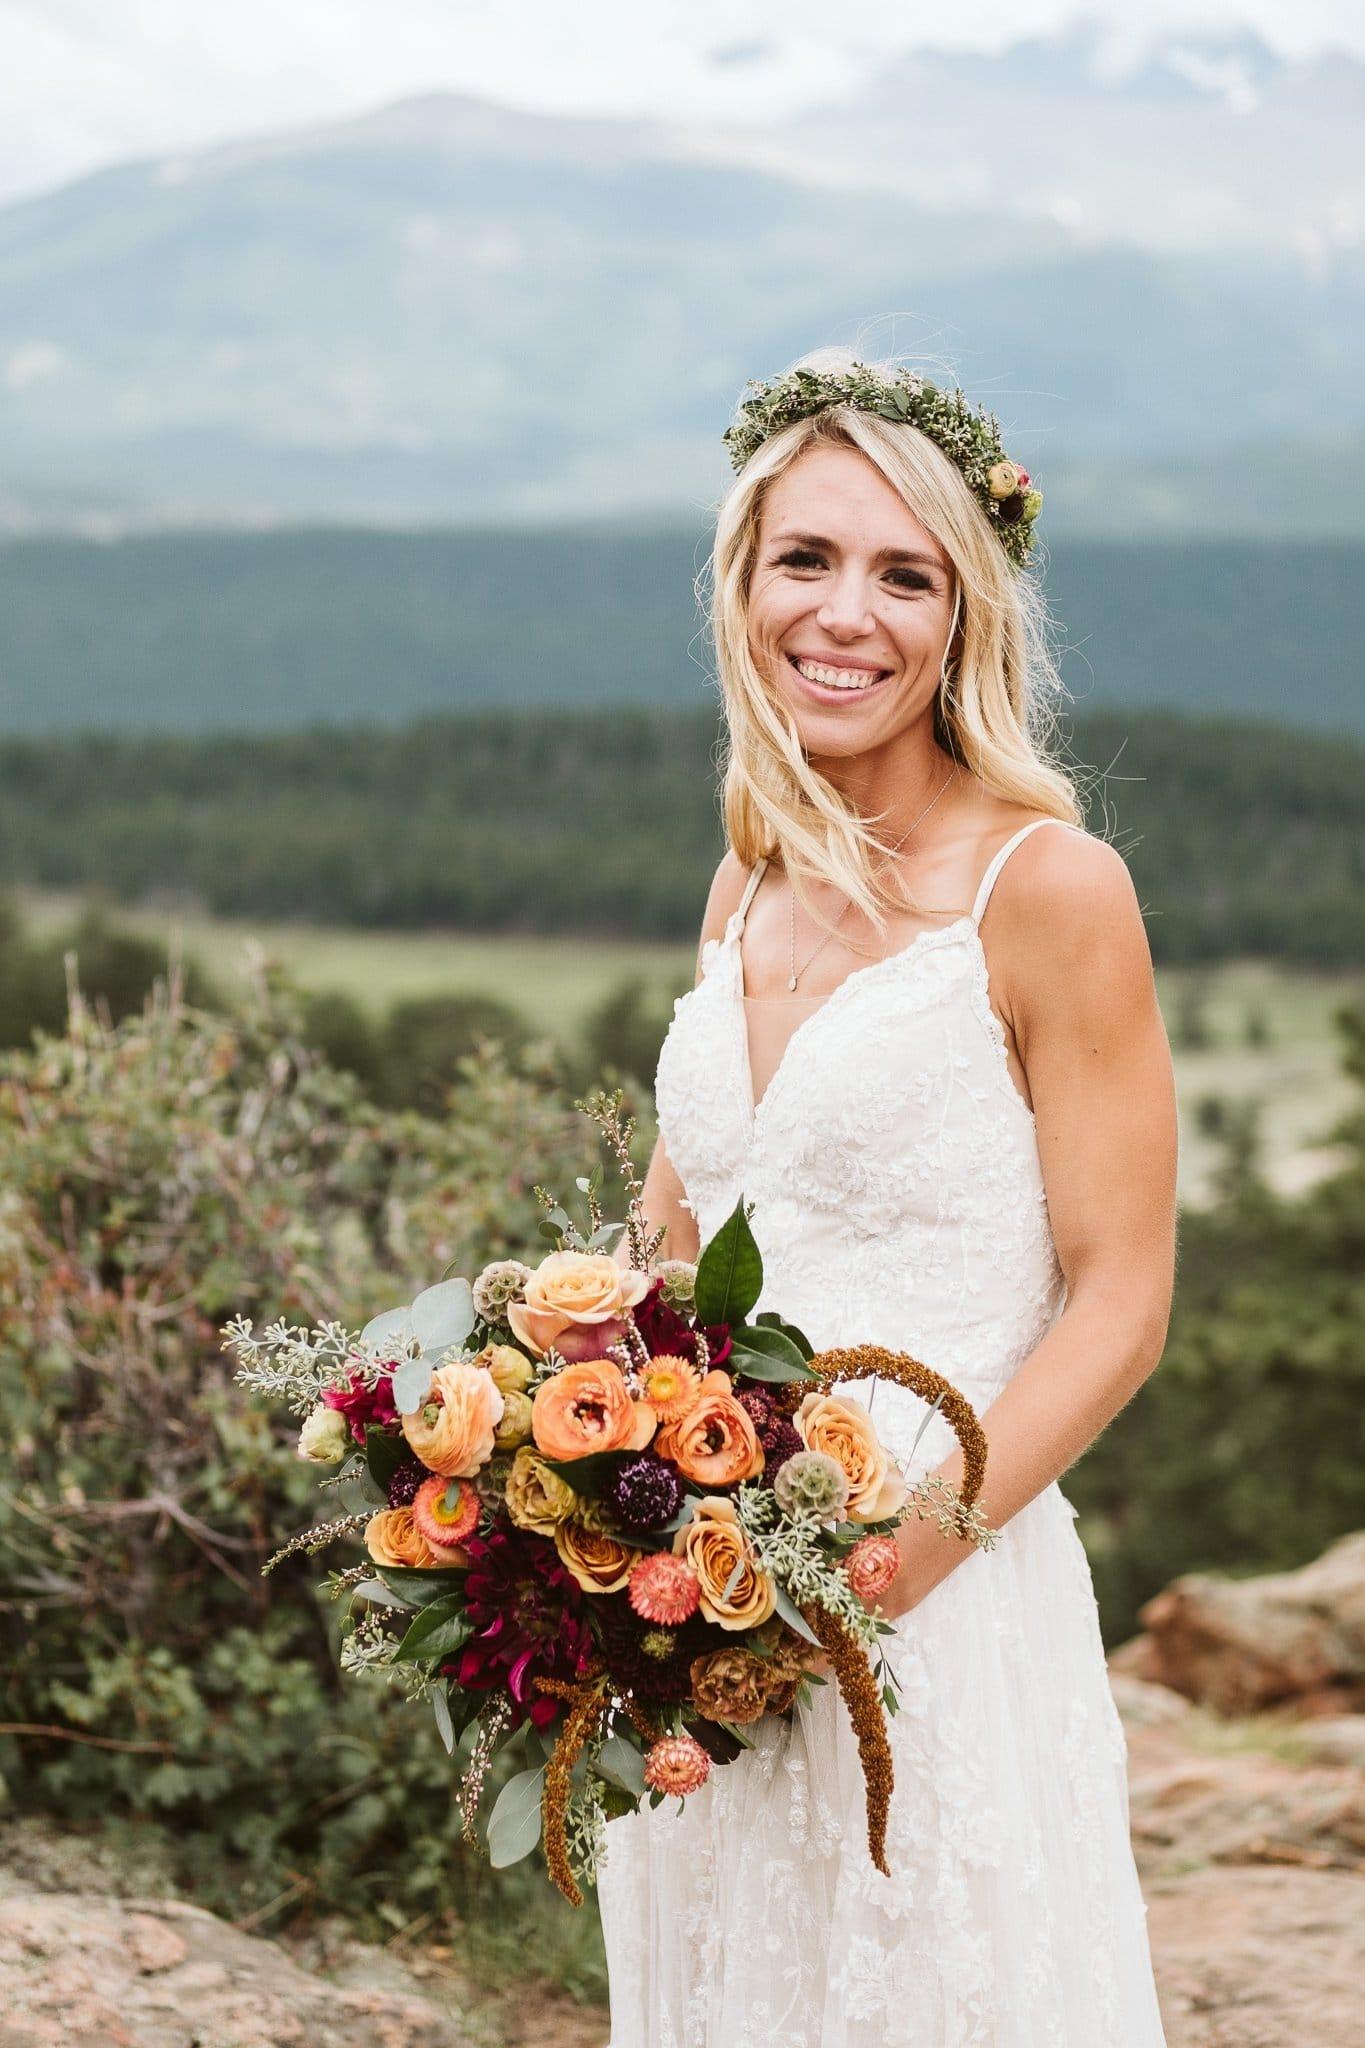 Wedding photos at 3M Curve in Rocky Mountain National Park, Estes Park wedding, Colorado wedding photographer, boho bride with floral crown and wild autumn color bouquet